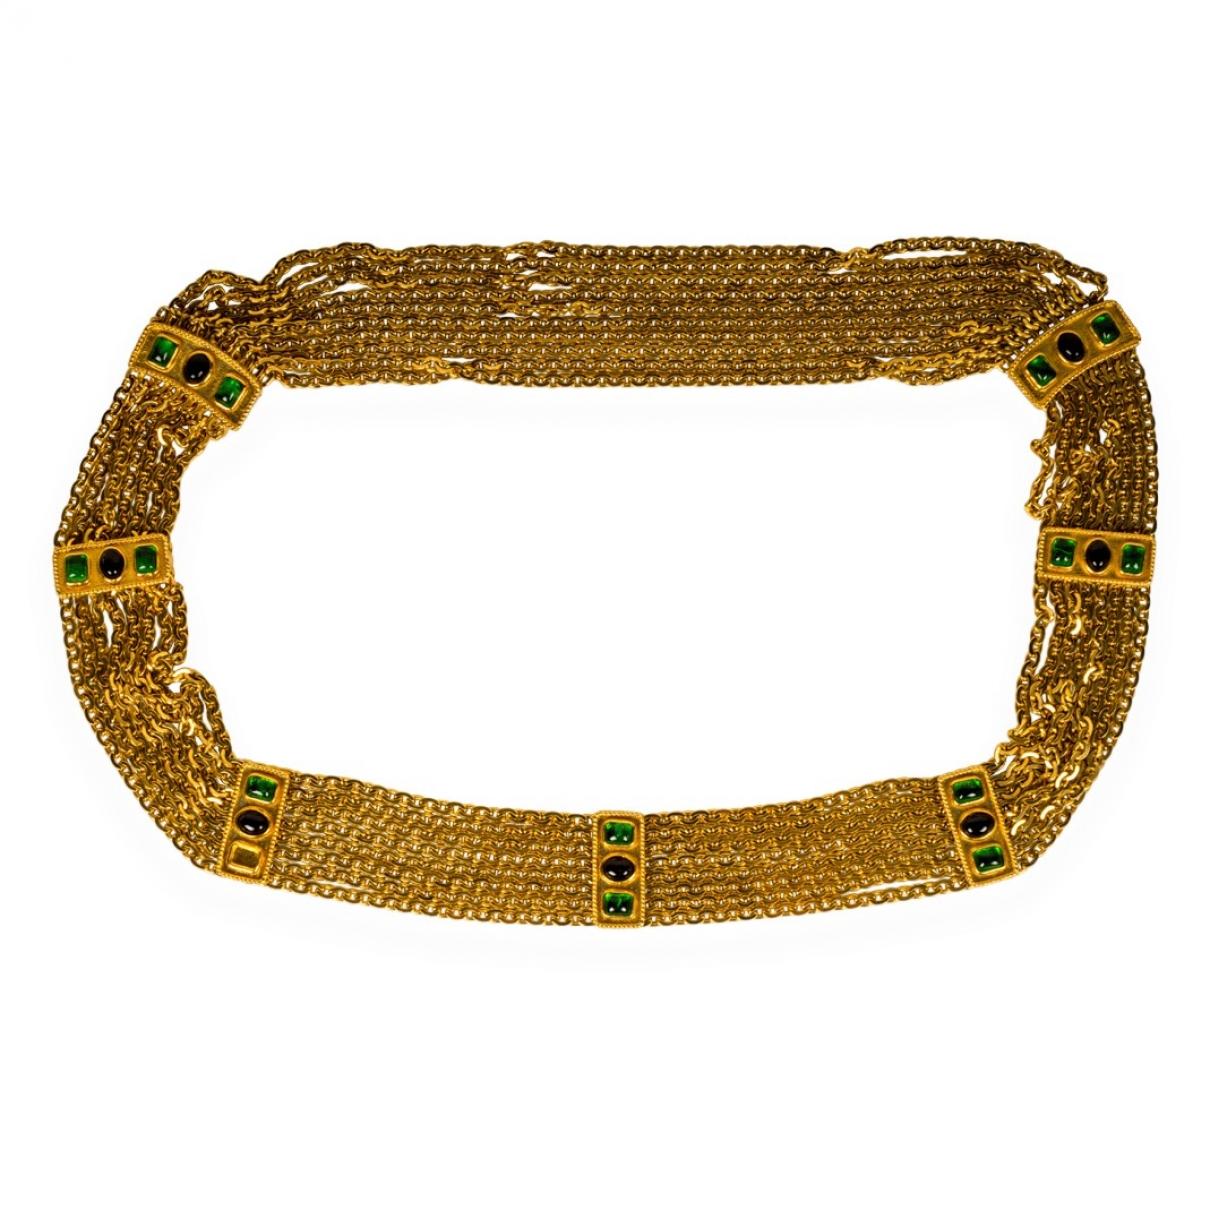 Chanel \N Gold Chain belt for Women 75 cm